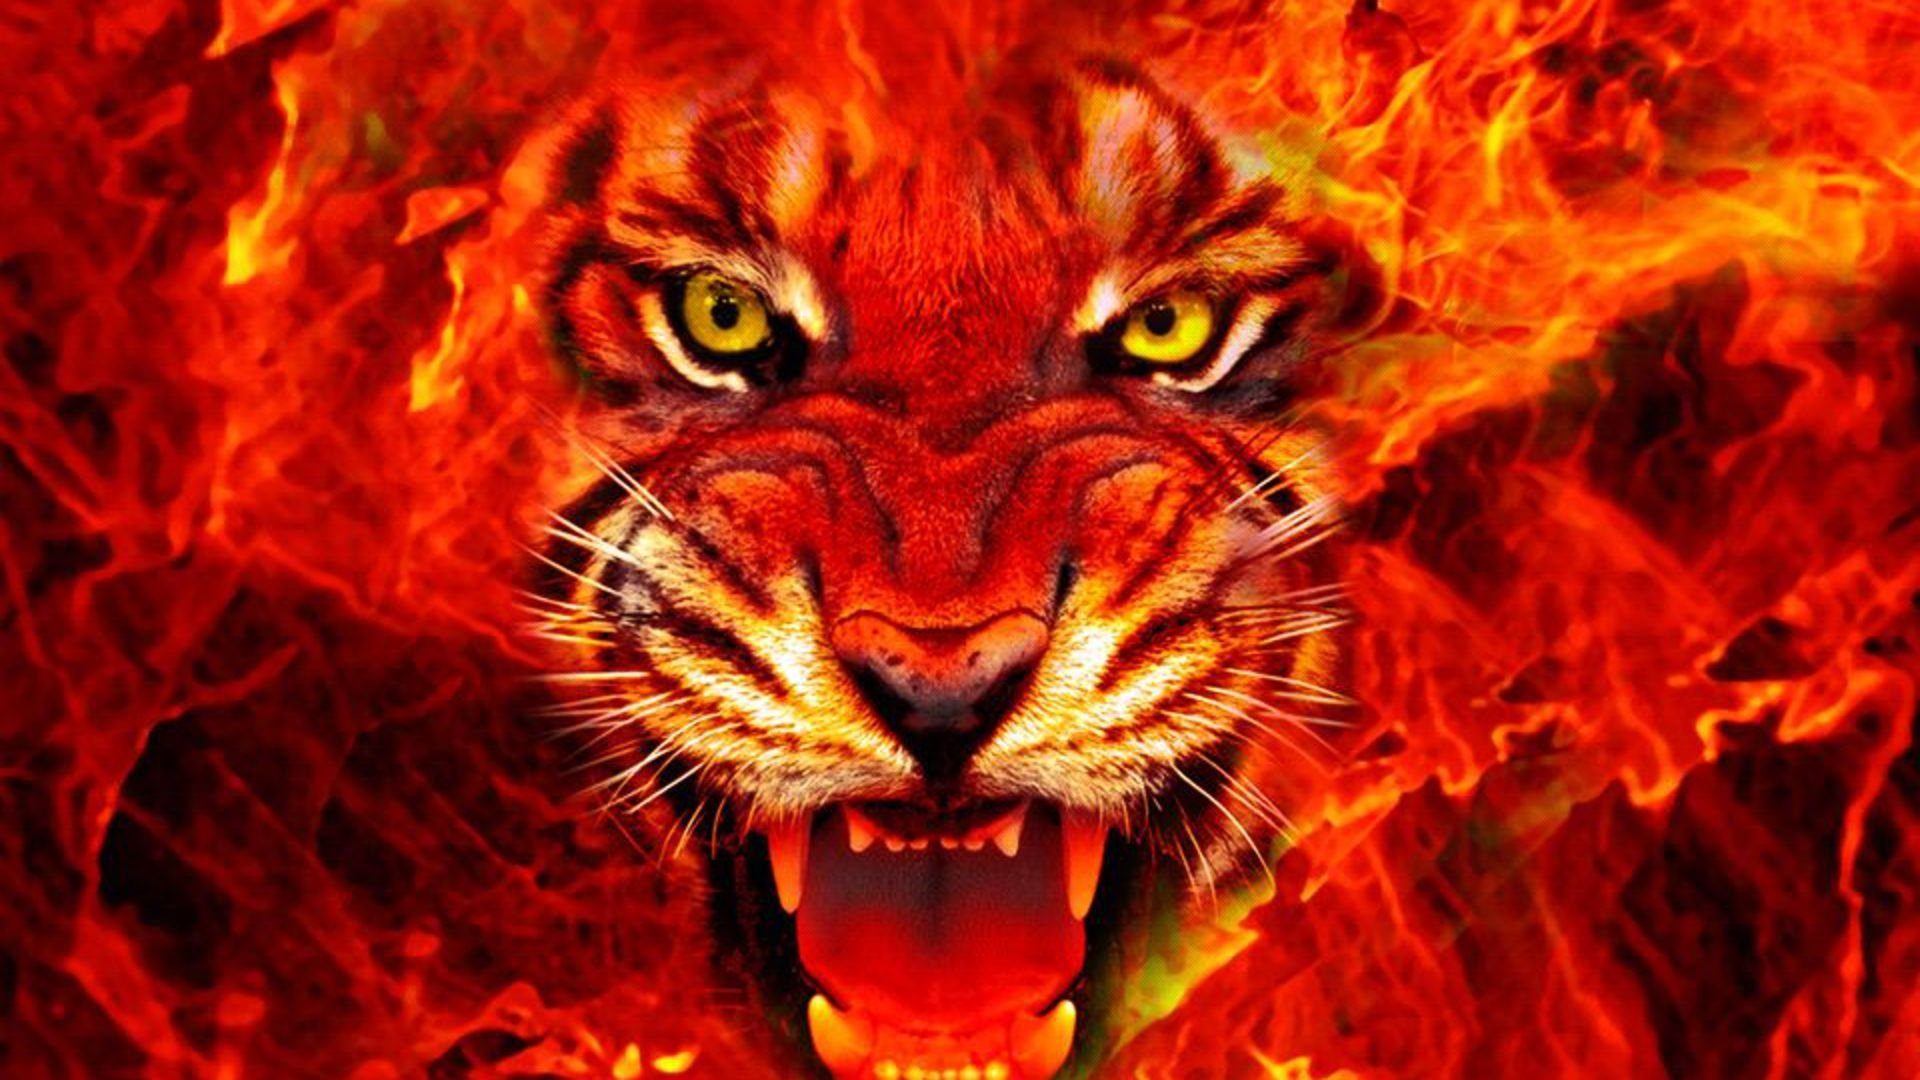 Tiger-Fire-HD wallpaper